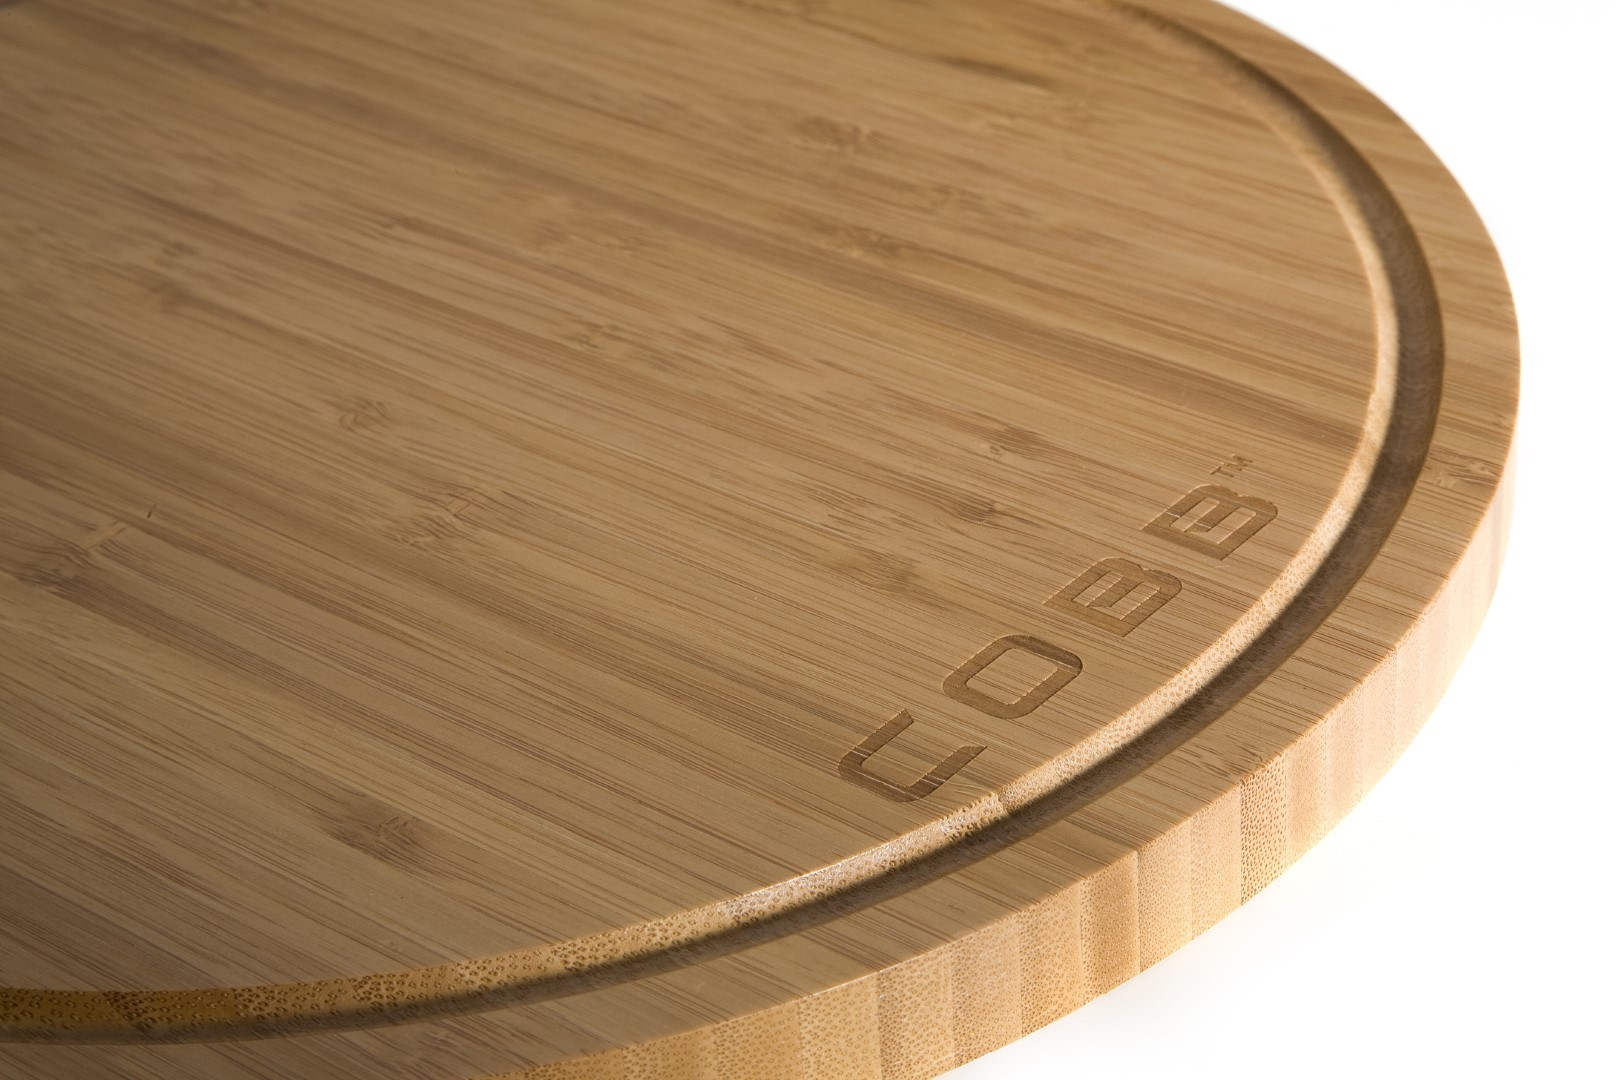 Snijplank bamboe Premier/Pro